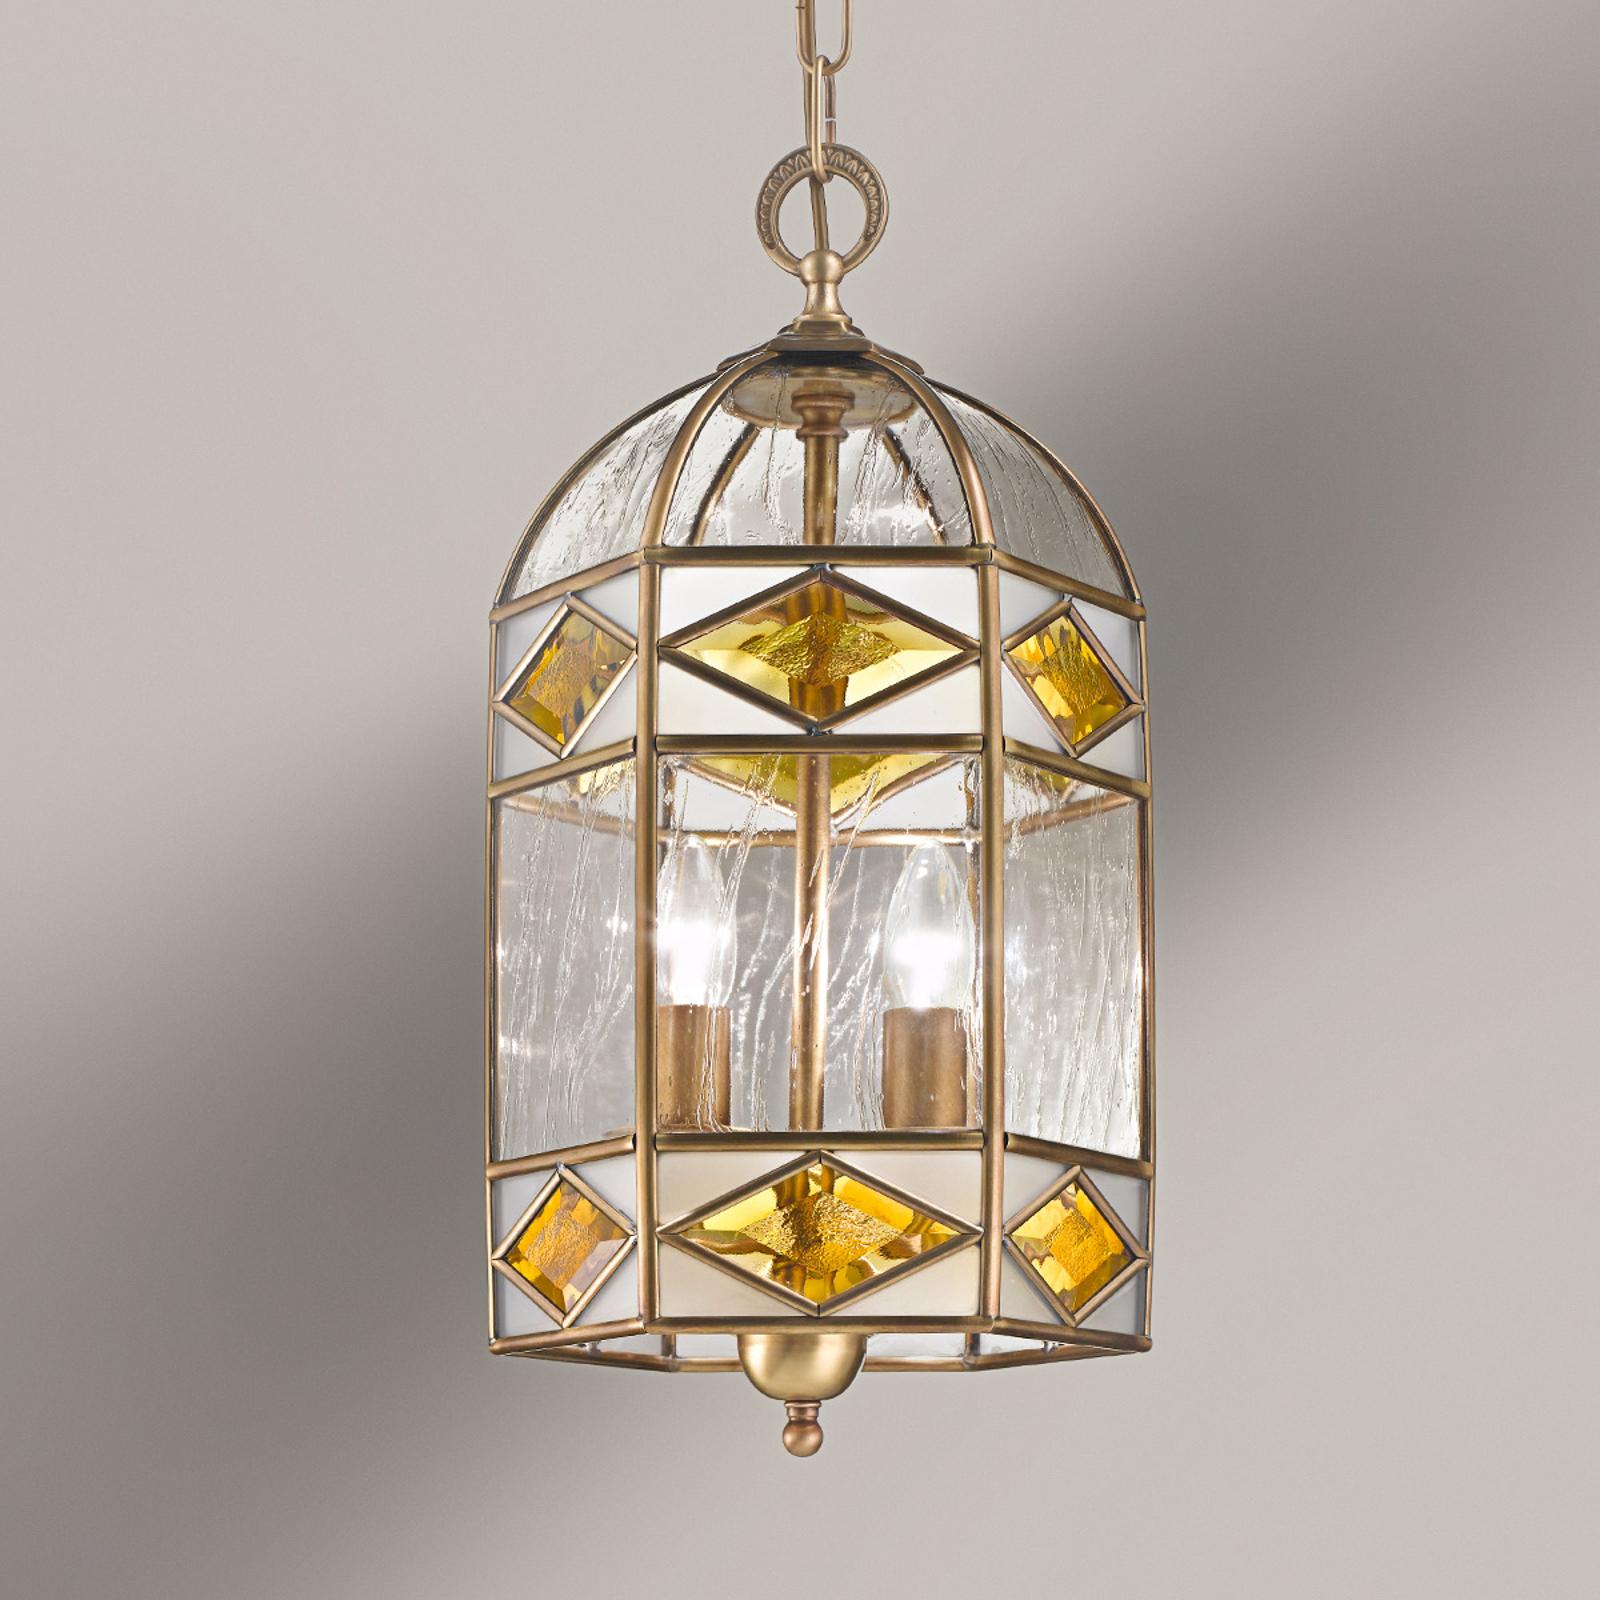 Emilia - lámpara colgante con vidrio catedral